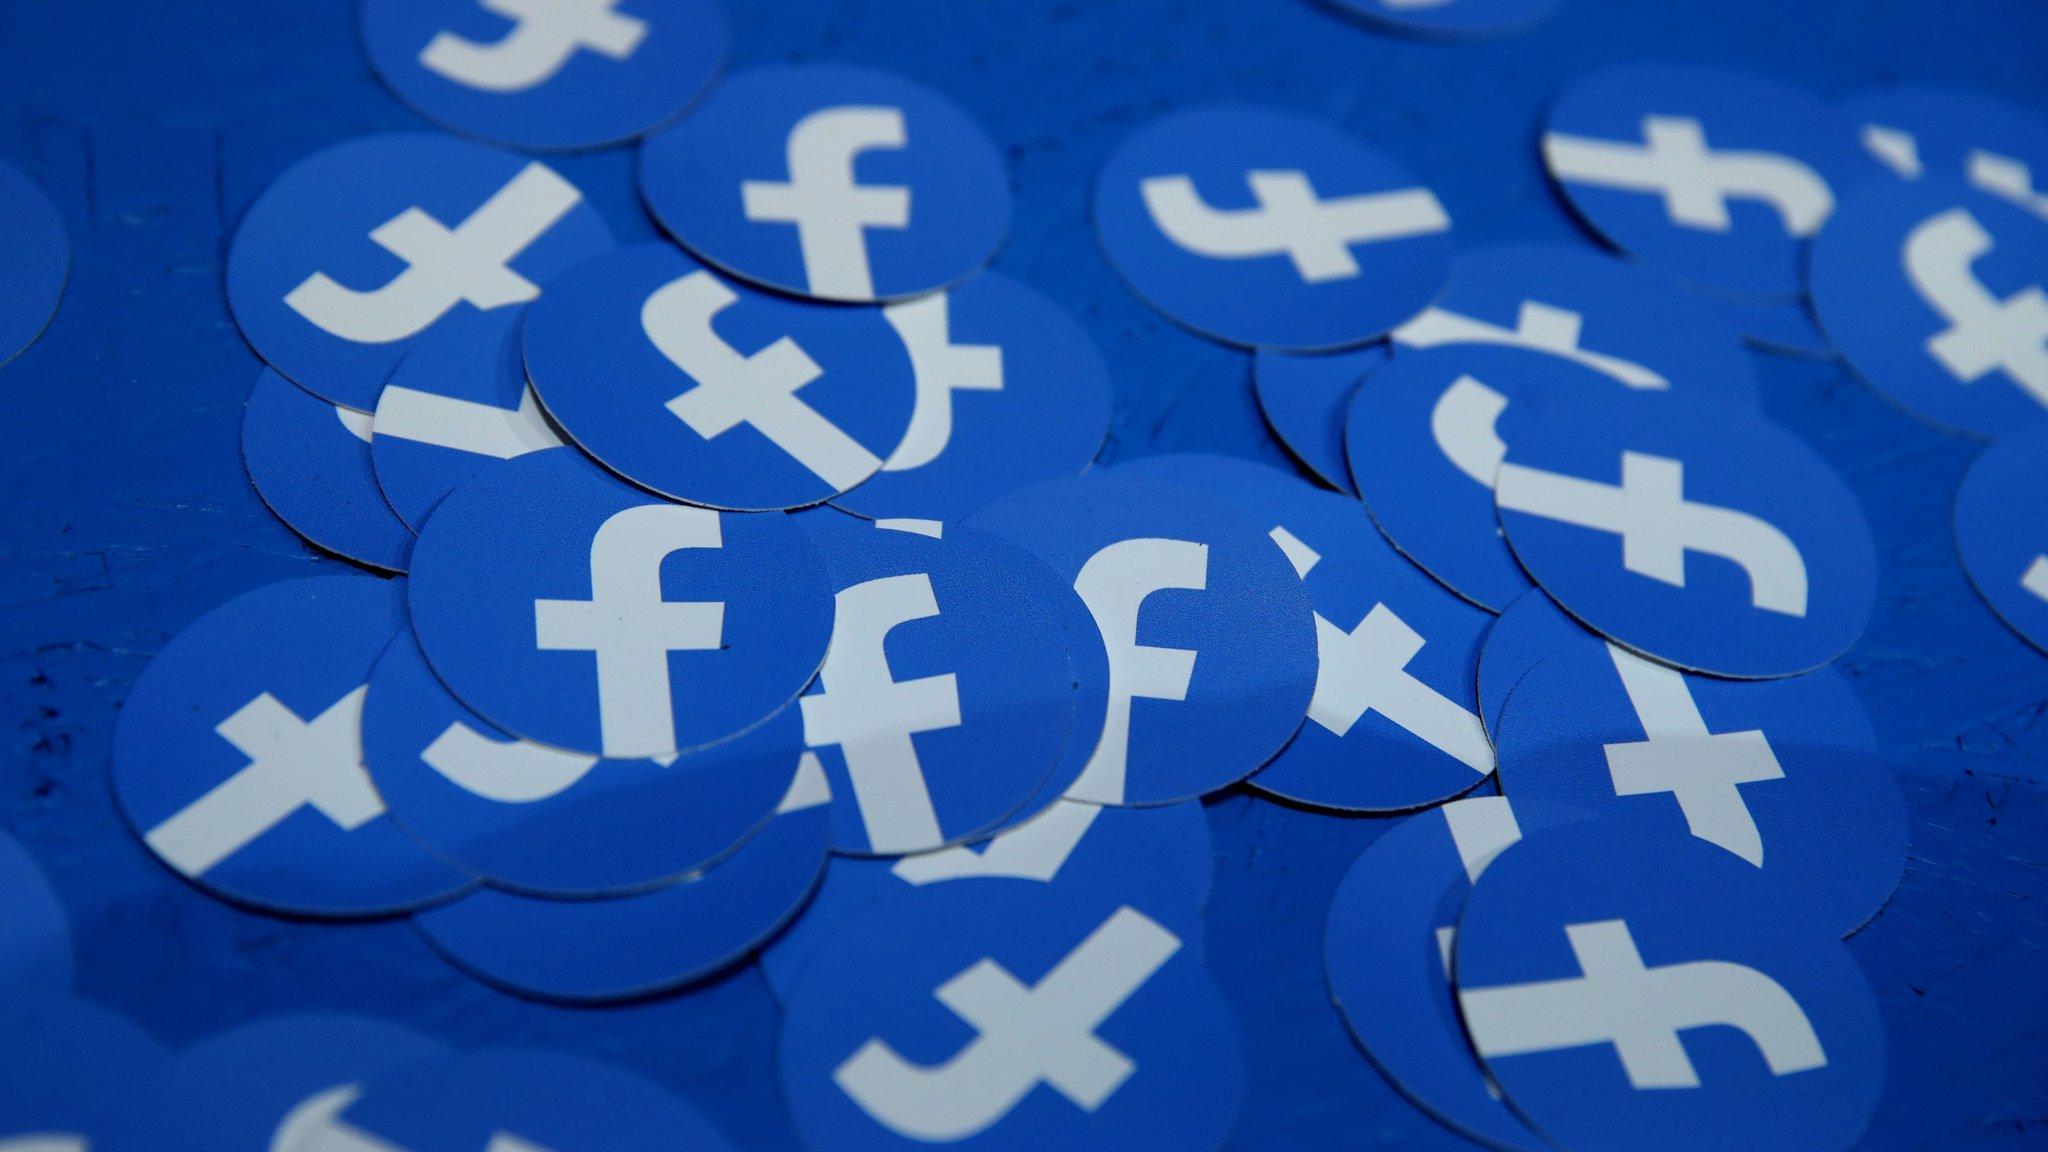 Four big questions facing Facebook's Libra coin | Financial Times